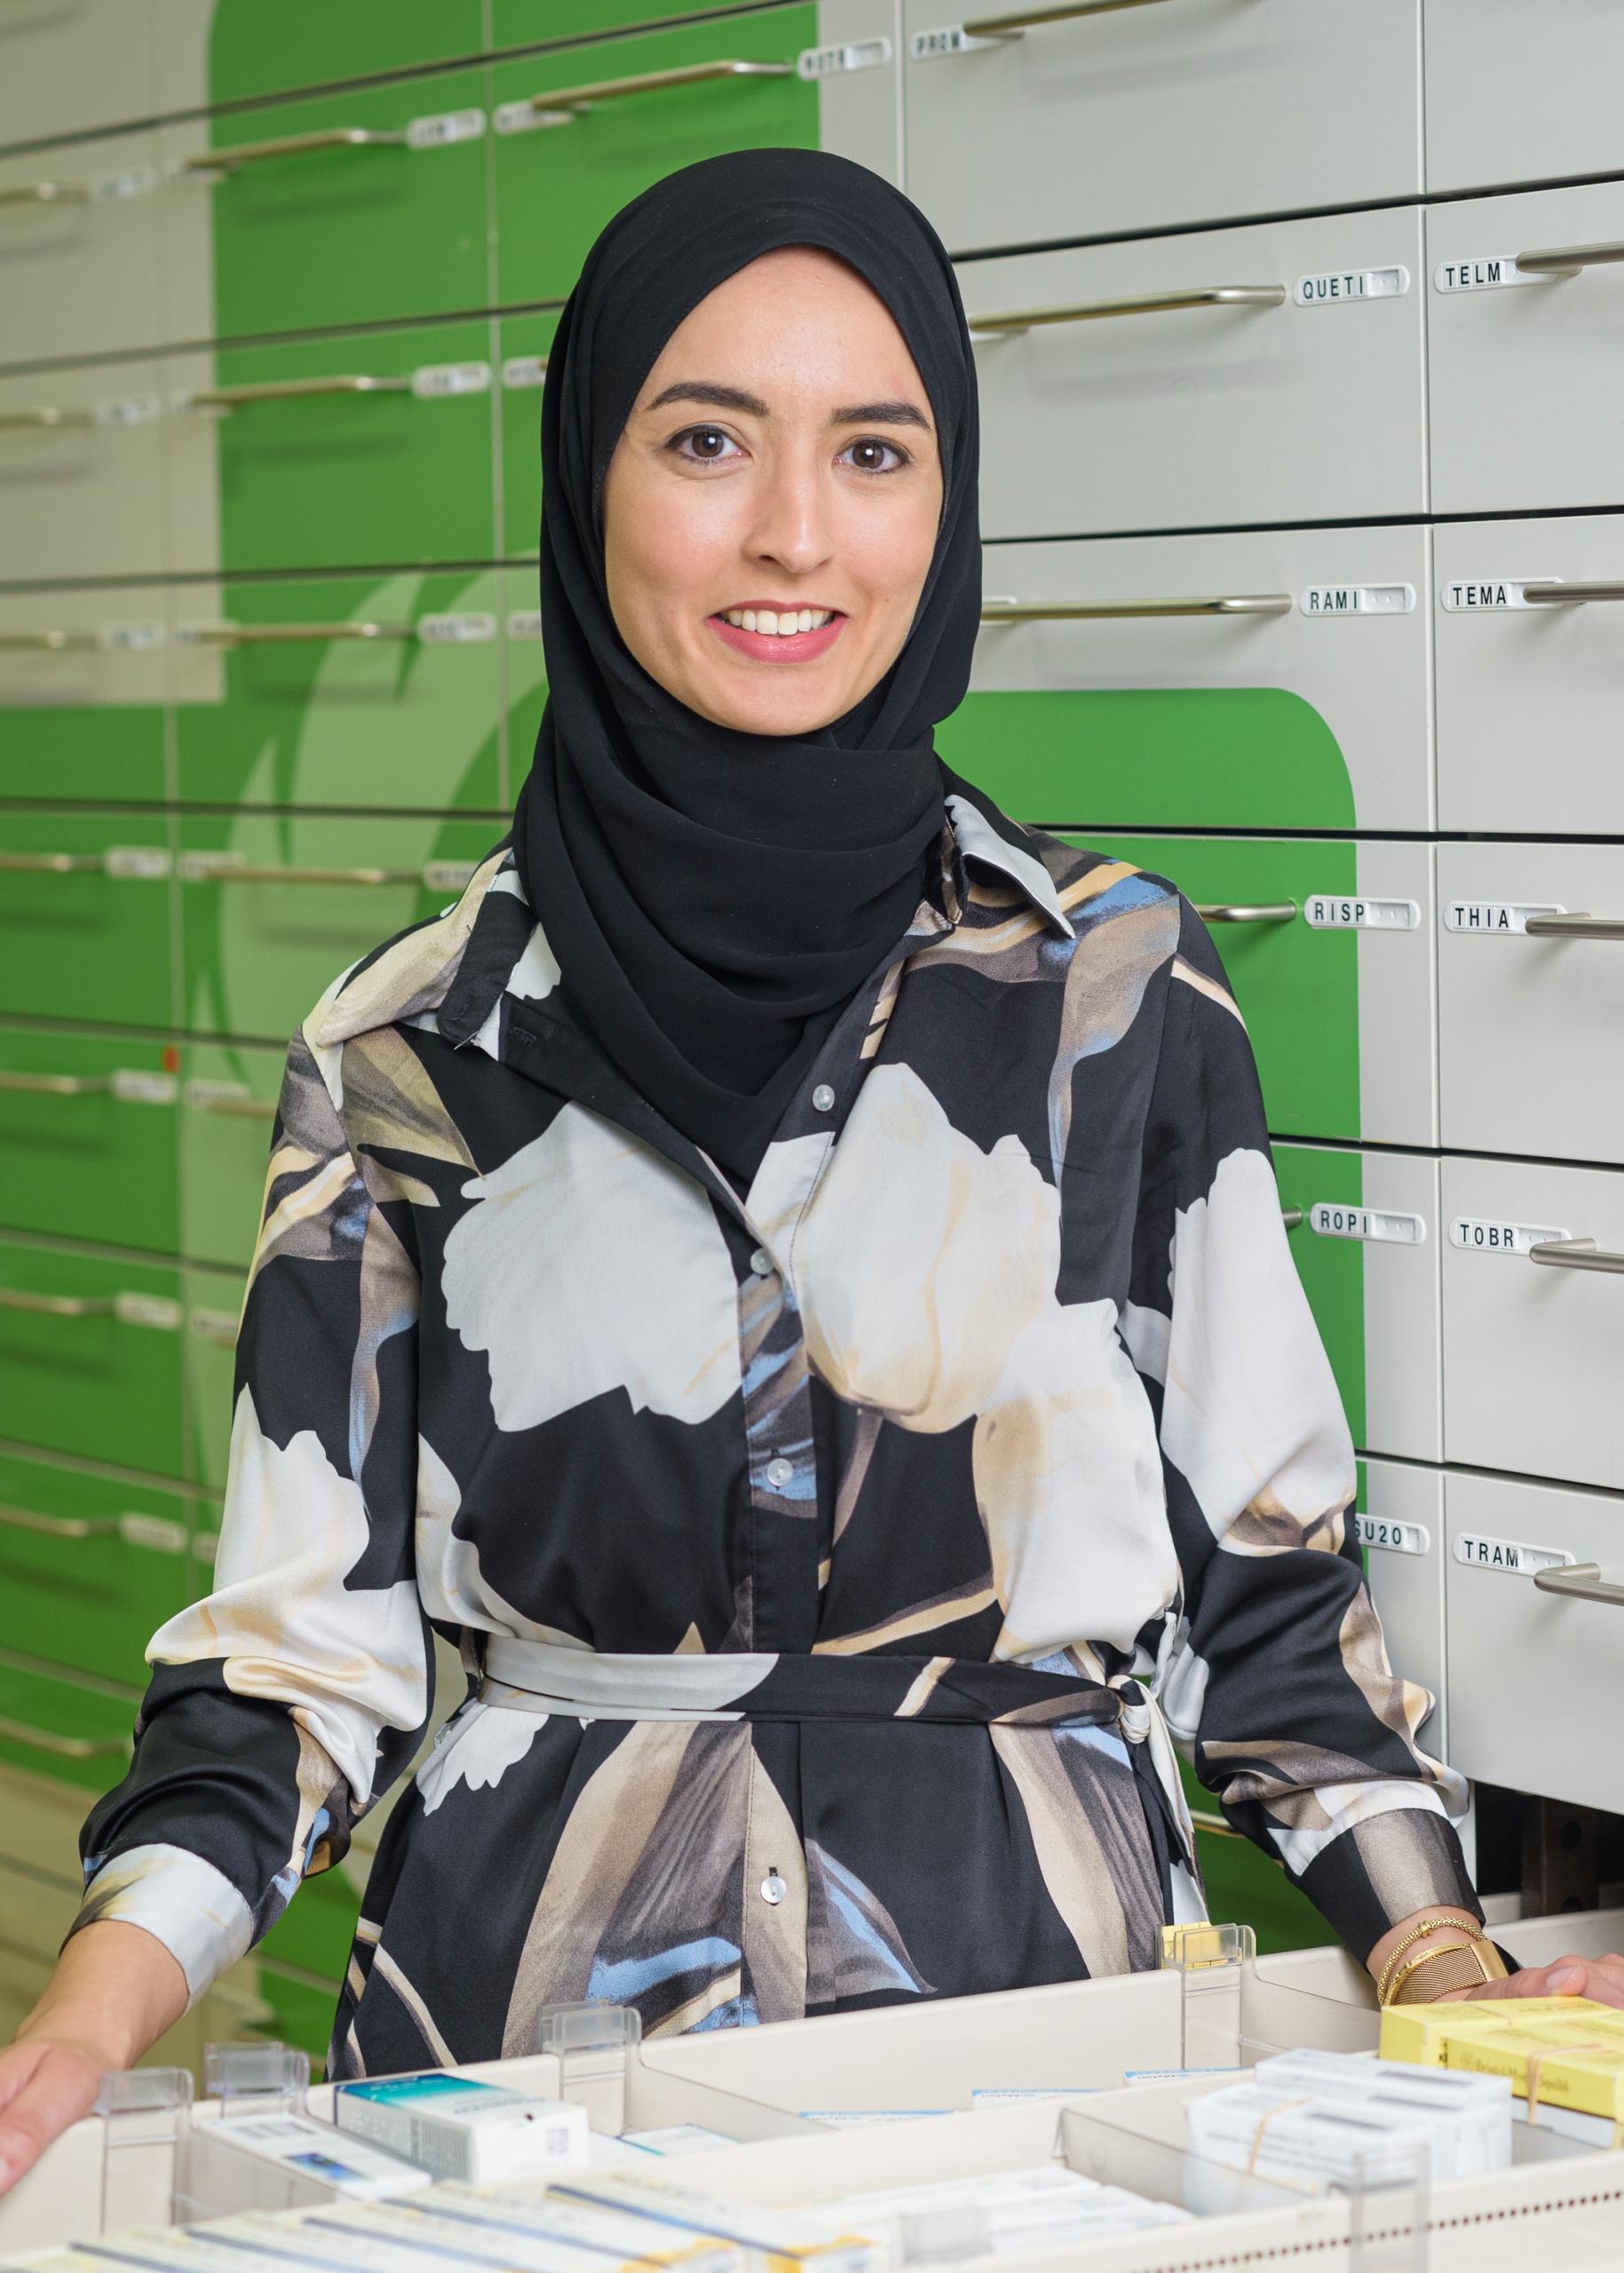 Jamila Abou - BENU Apotheek Burgemeesterwijk